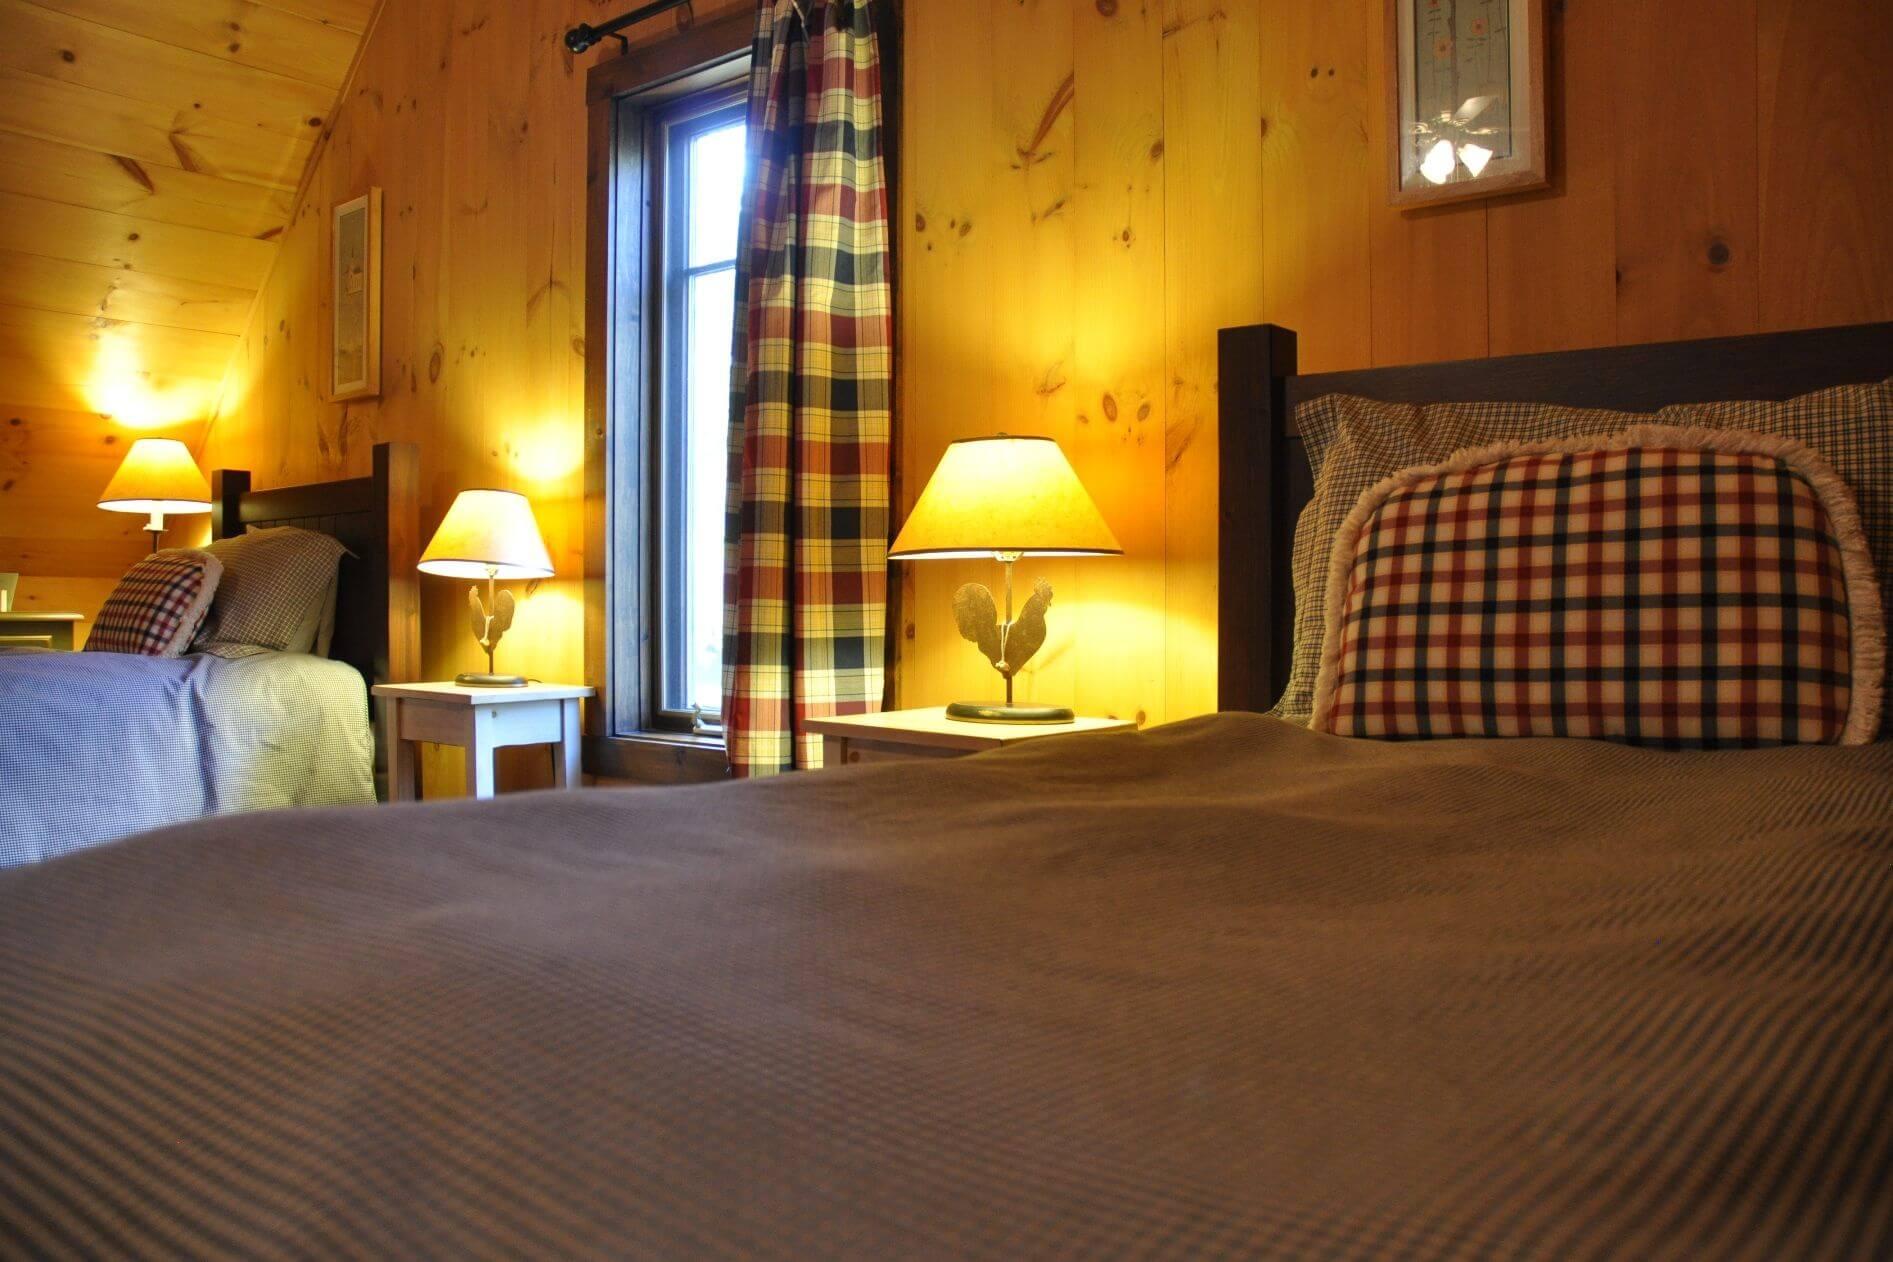 location de chalet de luxe le village windigo baskatong. Black Bedroom Furniture Sets. Home Design Ideas